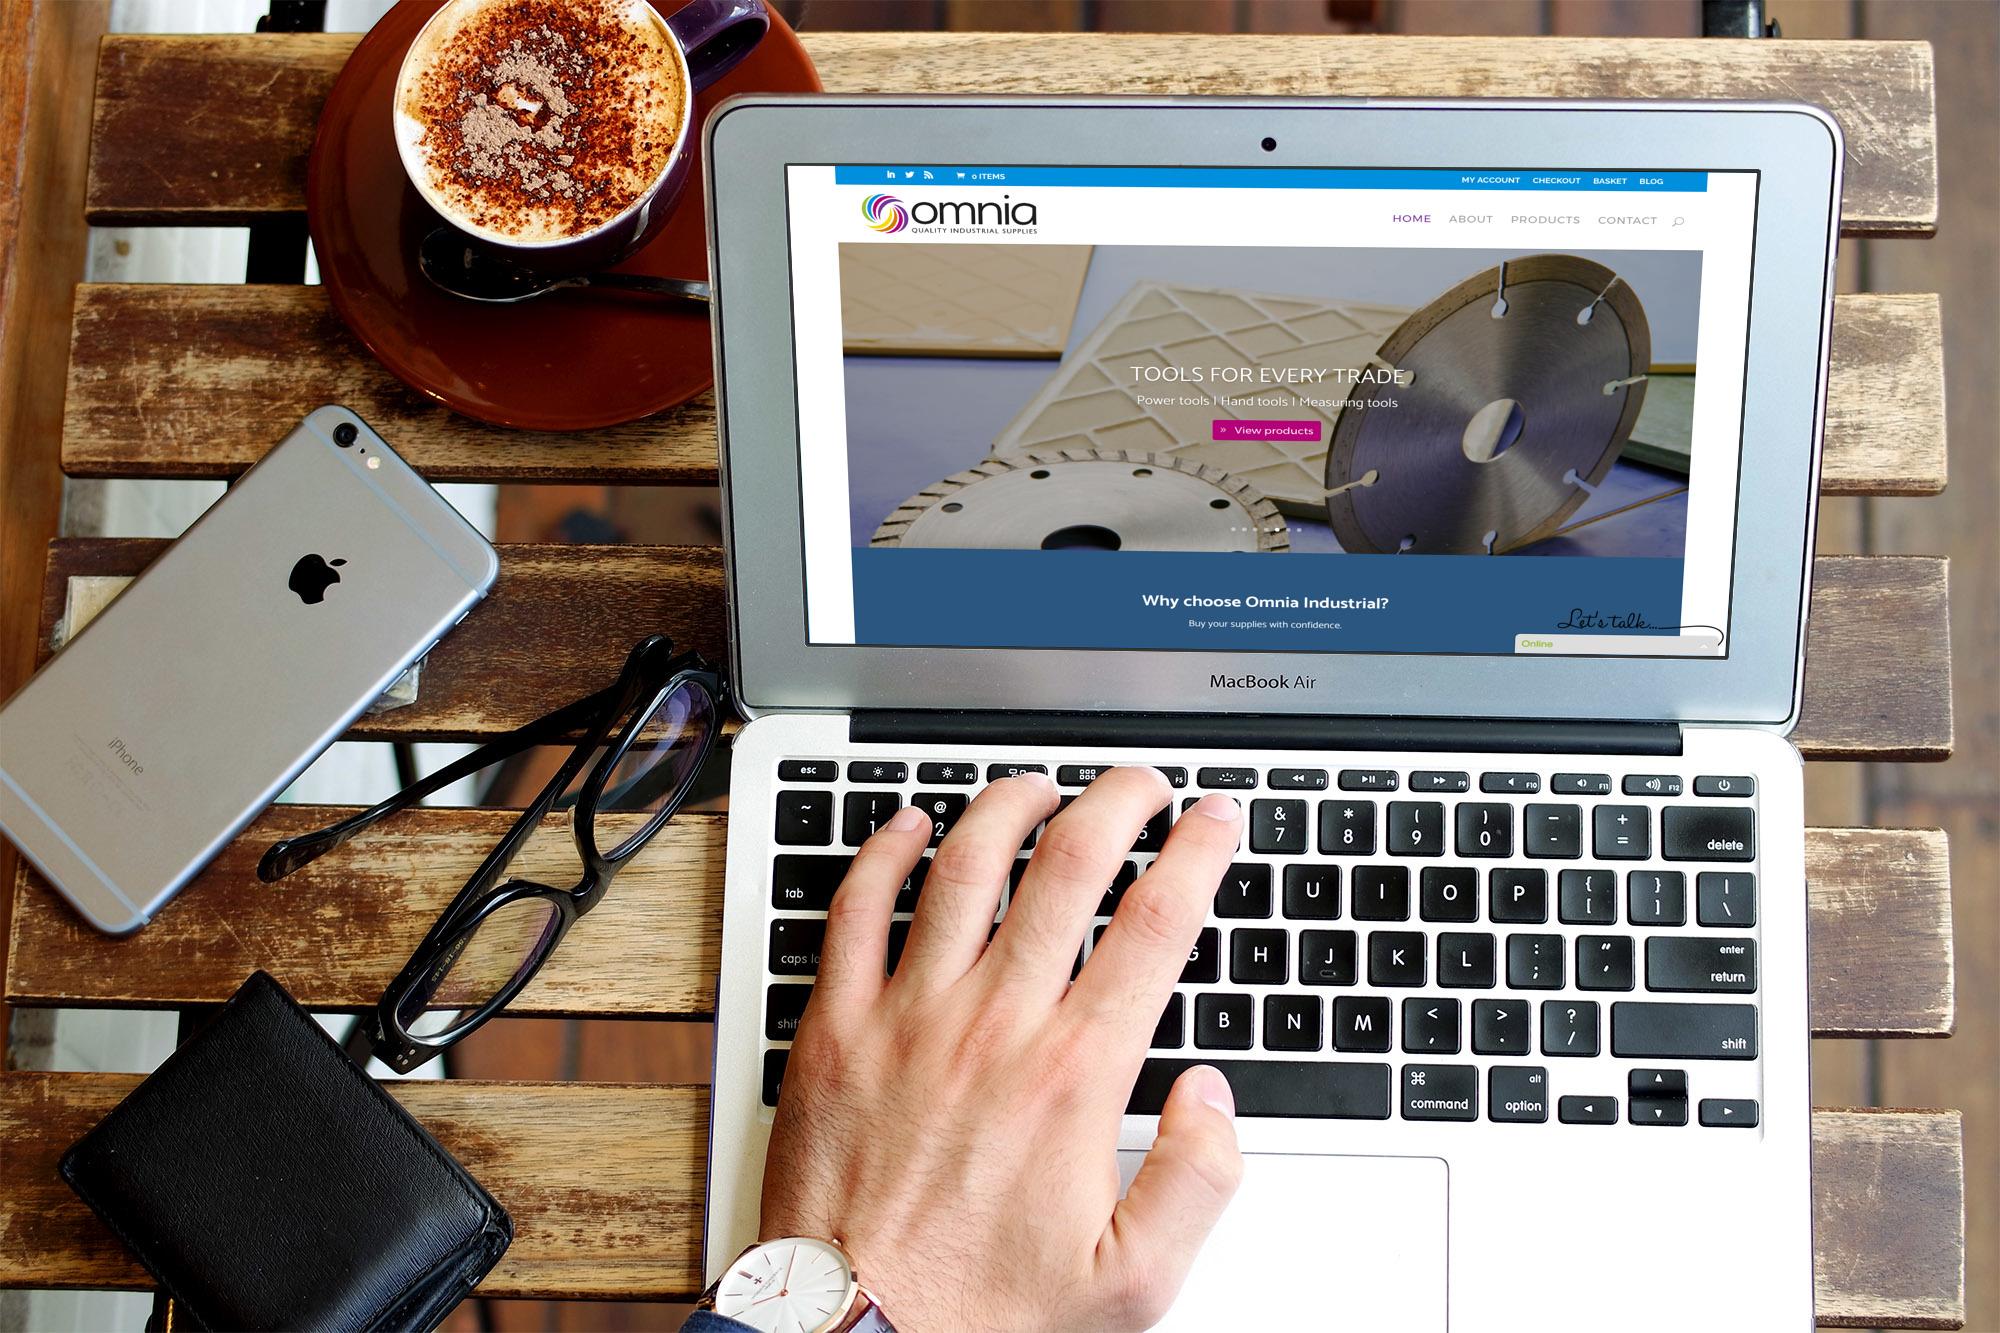 oinmockup - Ecommerce website design for industrial supplies retailer